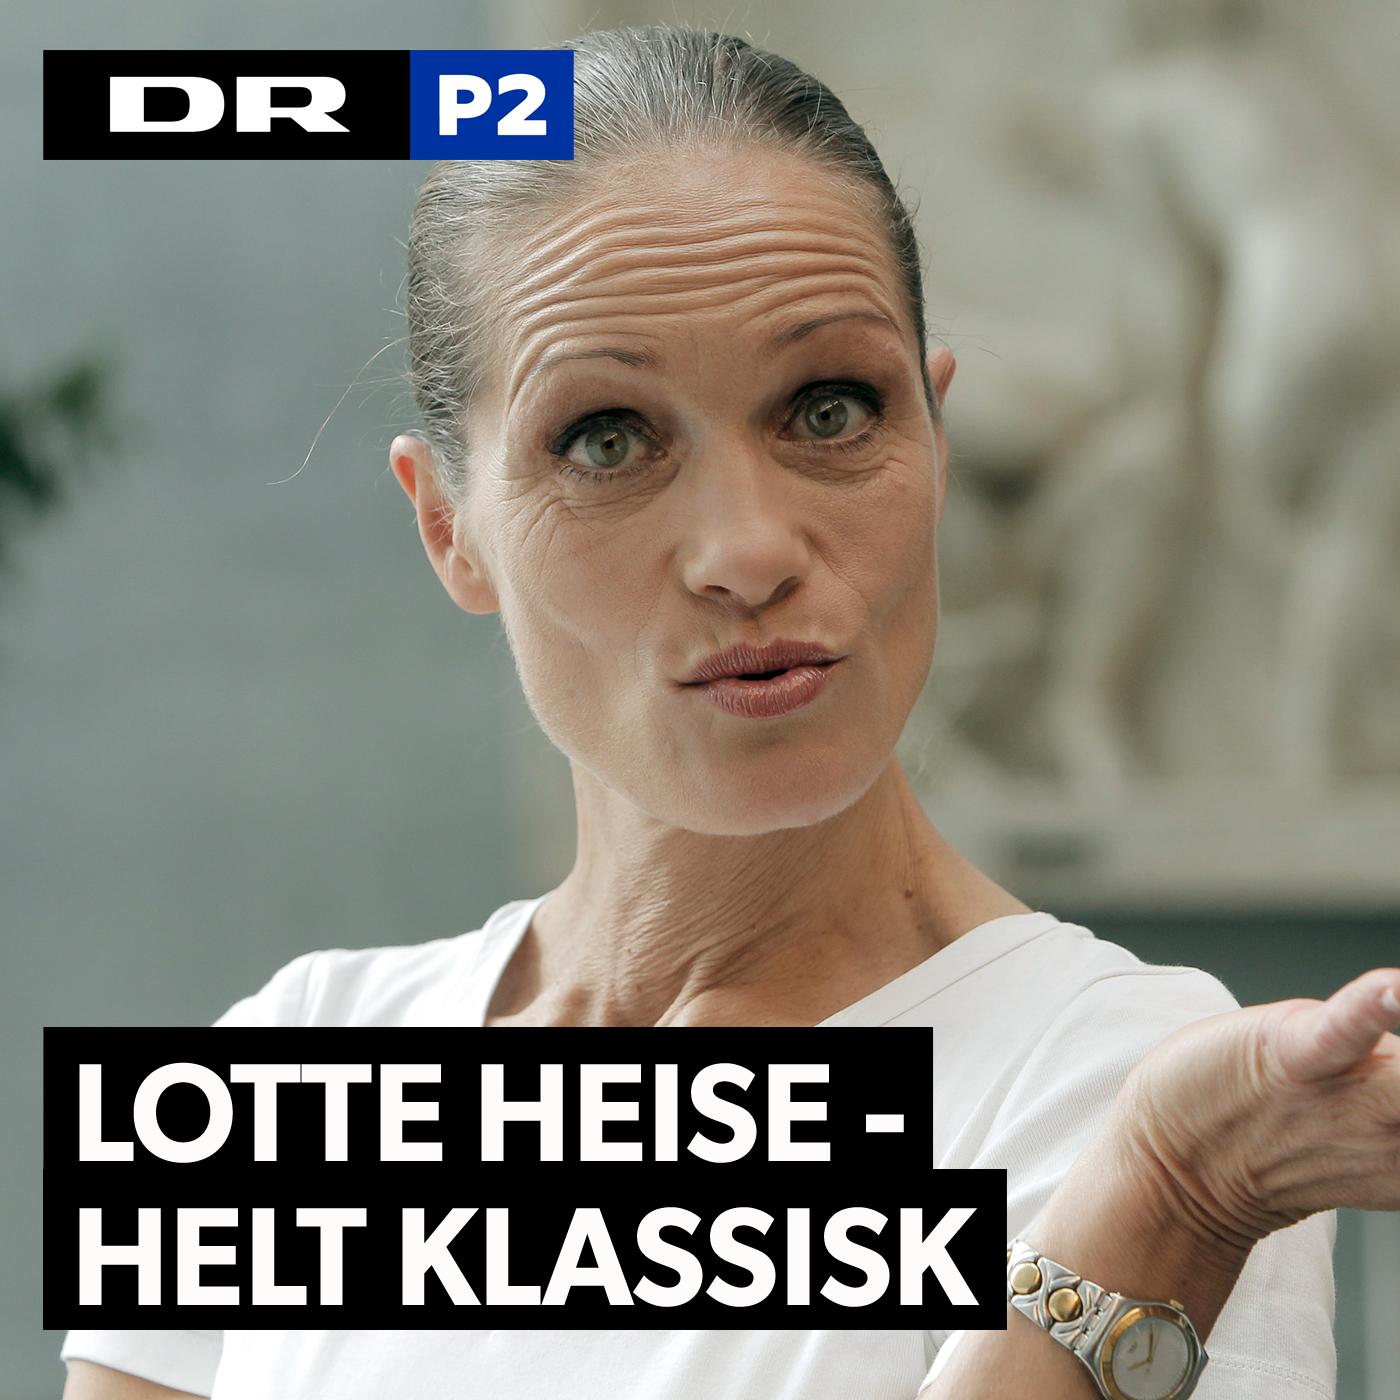 Lotte Heise - Helt Klassisk